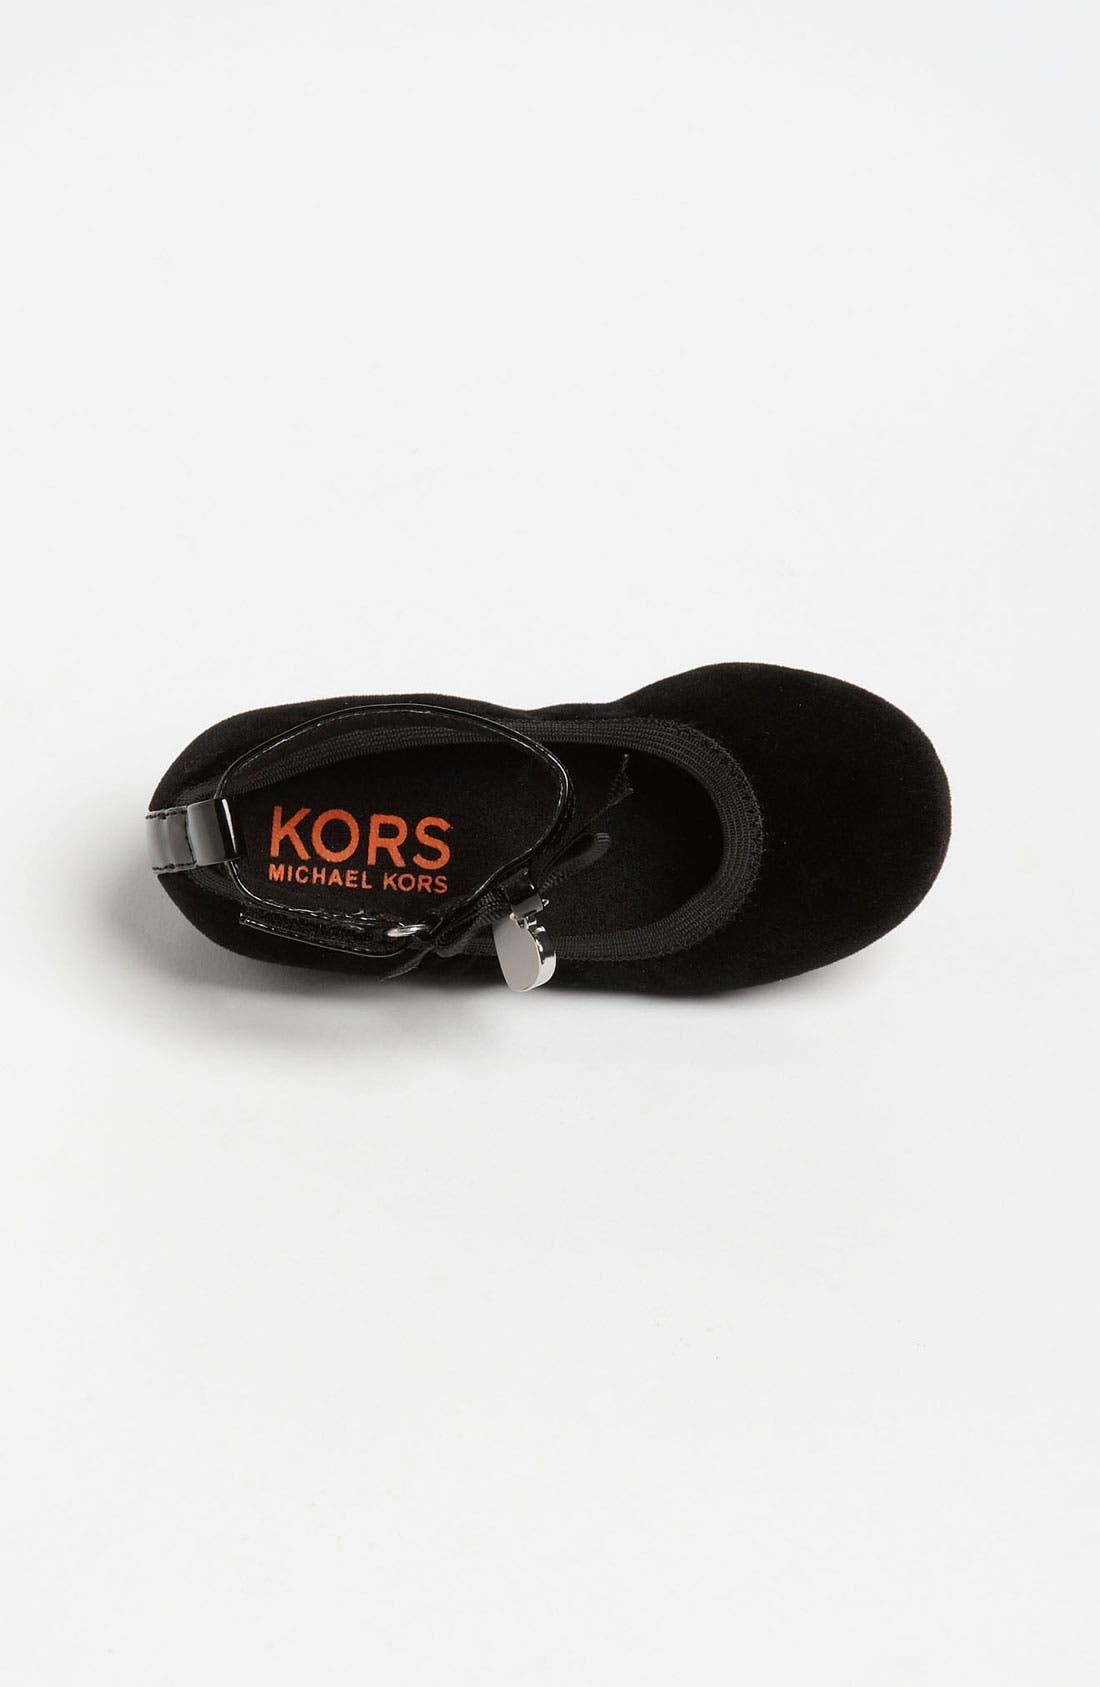 Alternate Image 3  - KORS Michael Kors 'Abbie' Flat (Toddler)